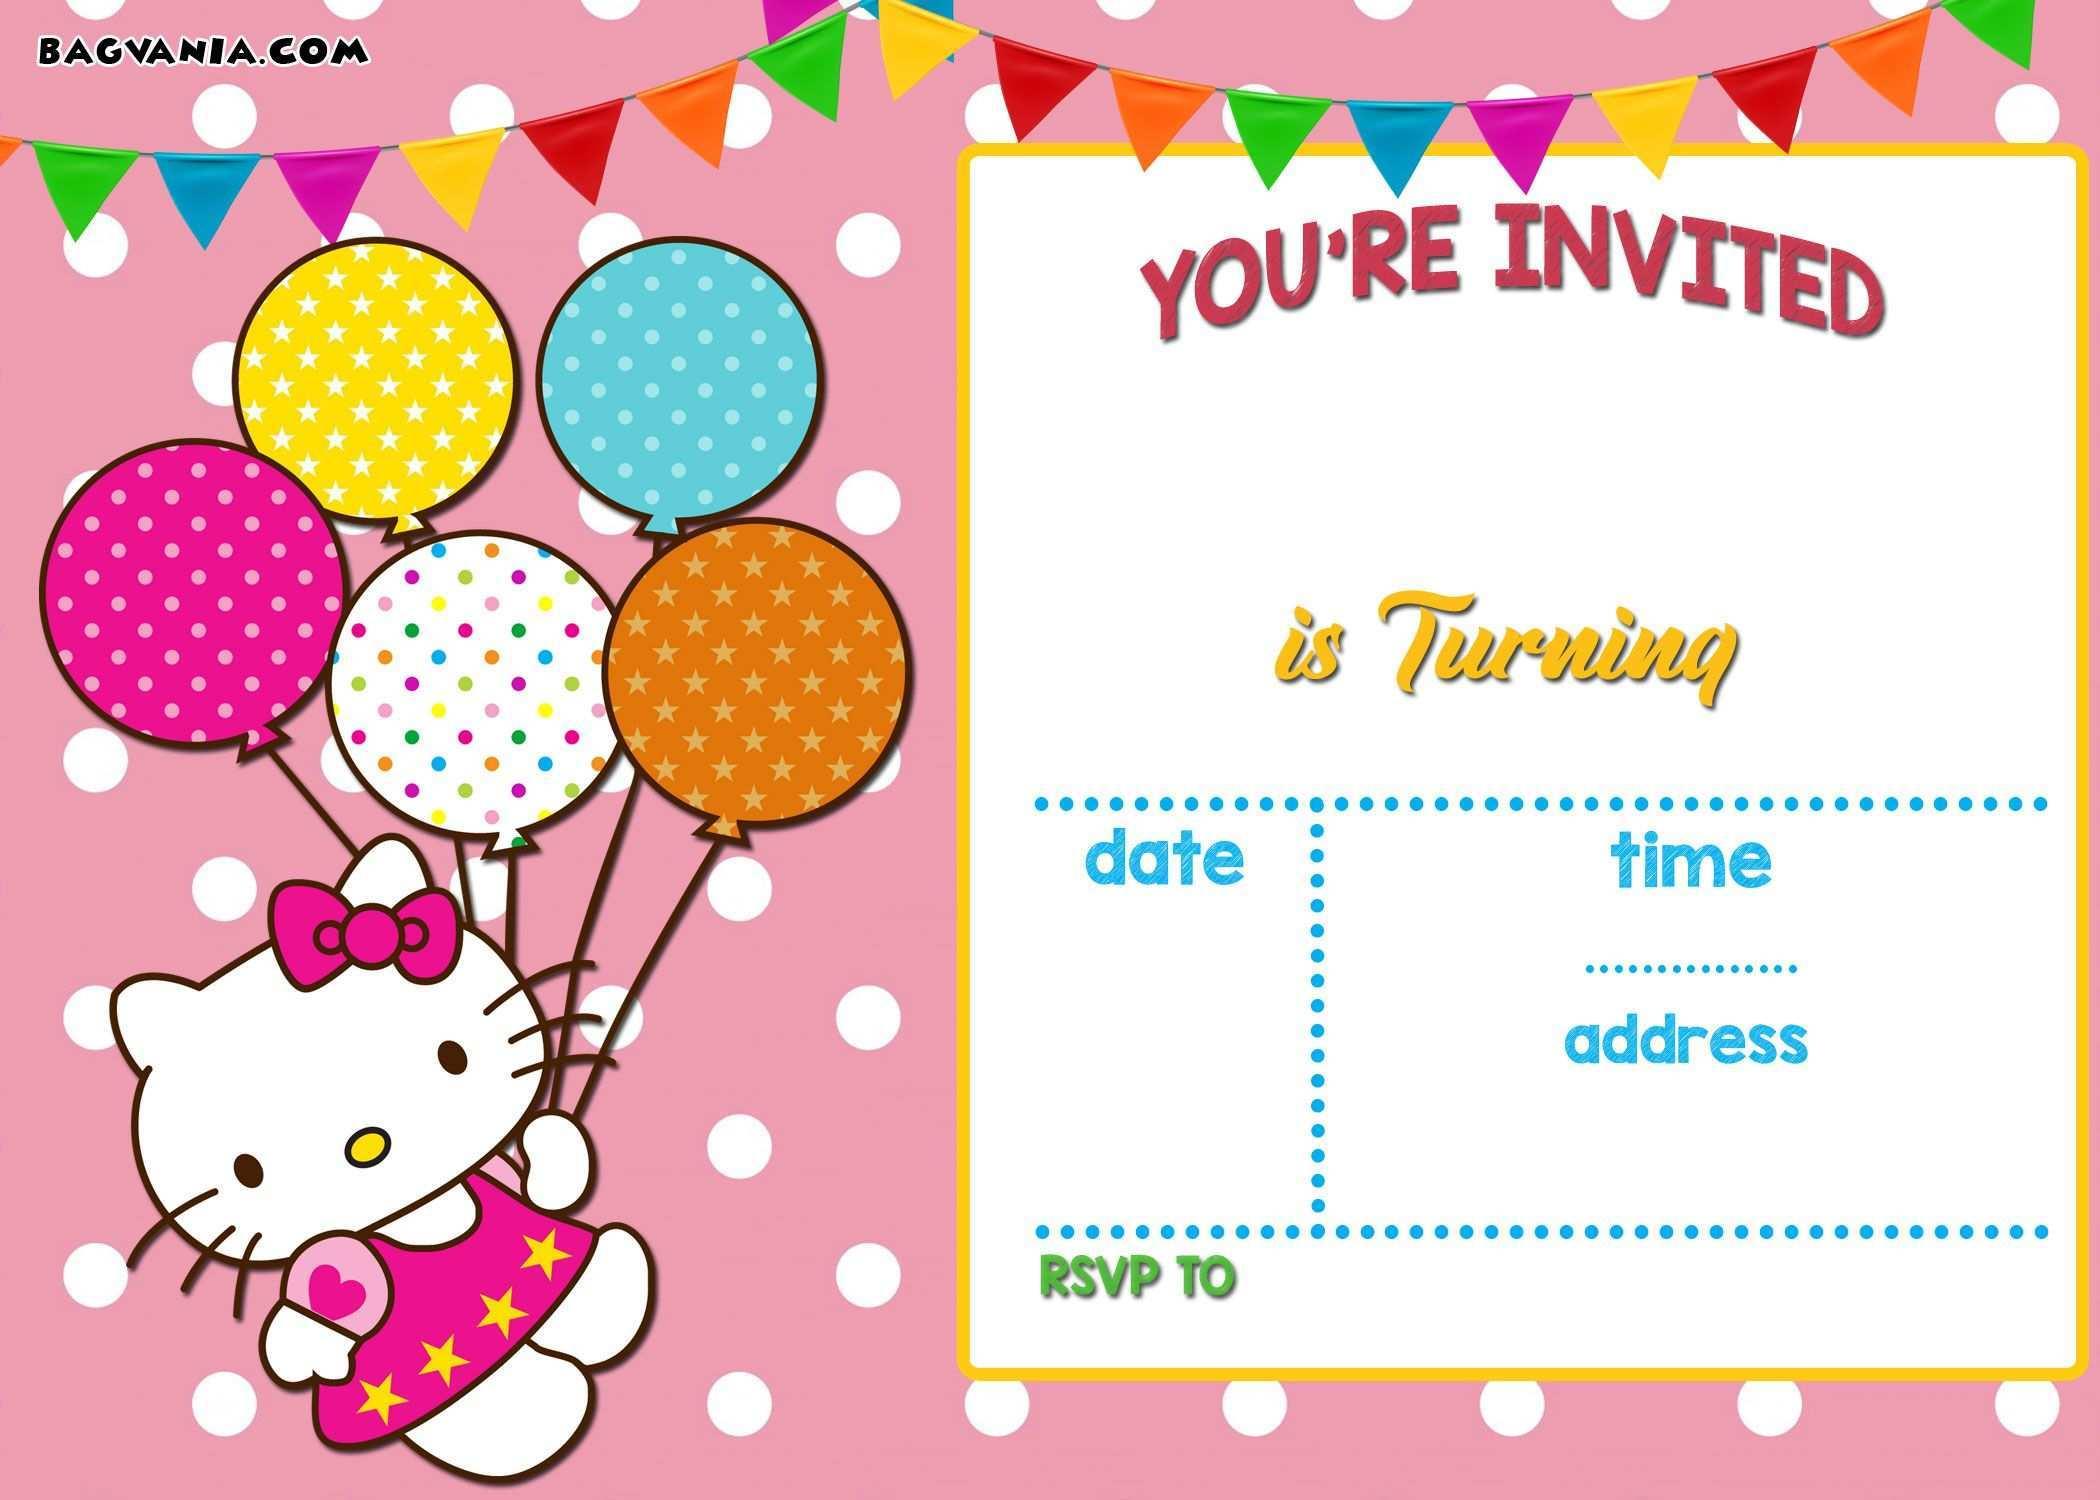 22 Format 7Th Birthday Invitation Template Hello Kitty in Word by 7Th Birthday Invitation Template Hello Kitty